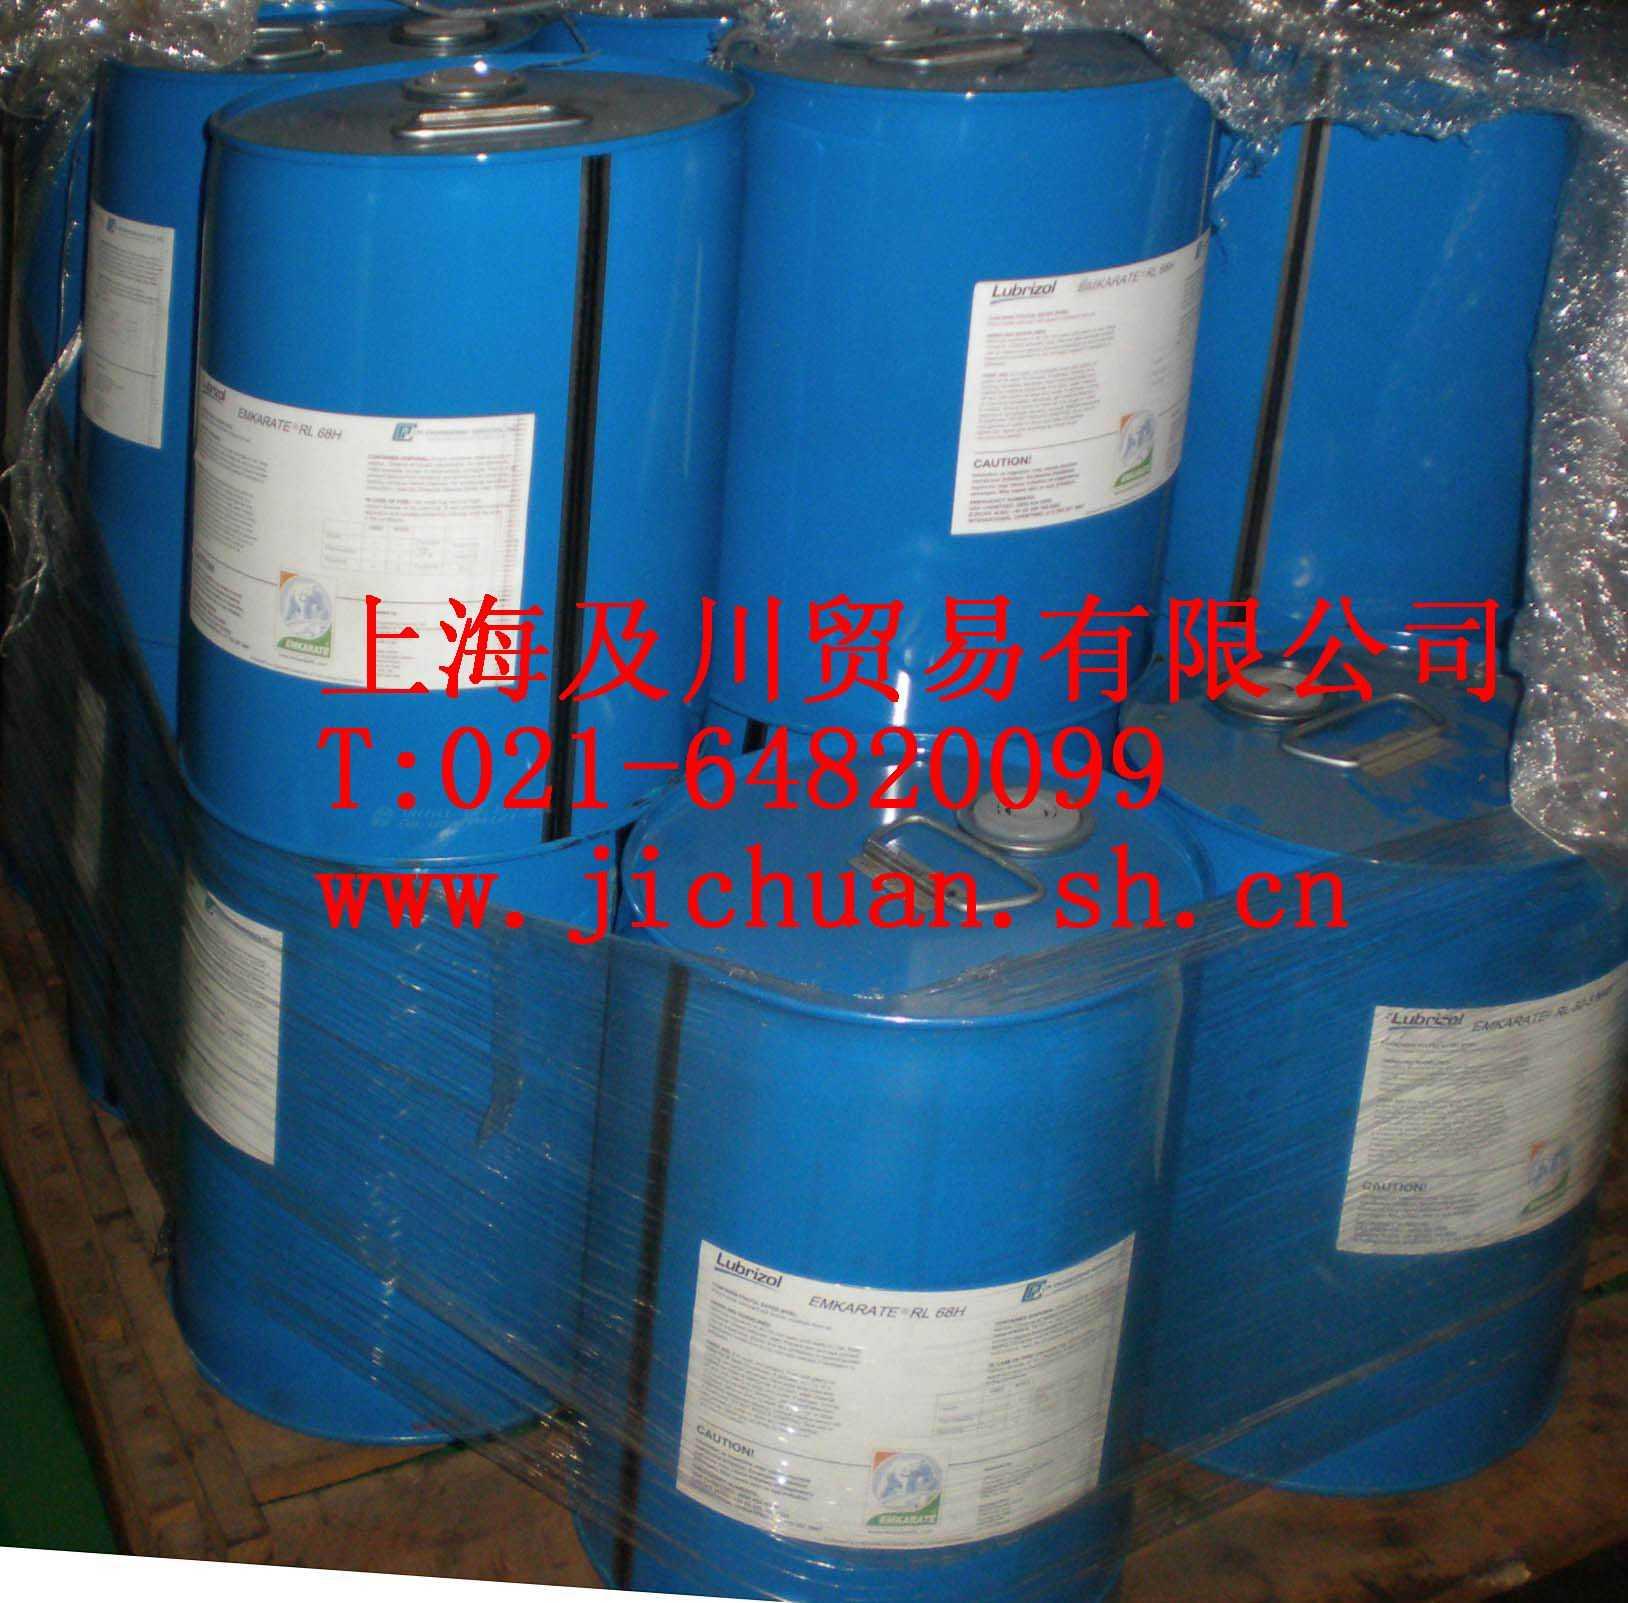 EmkarateRL32-3MAF谷轮压缩机初装油,上海及川贸易有限公司